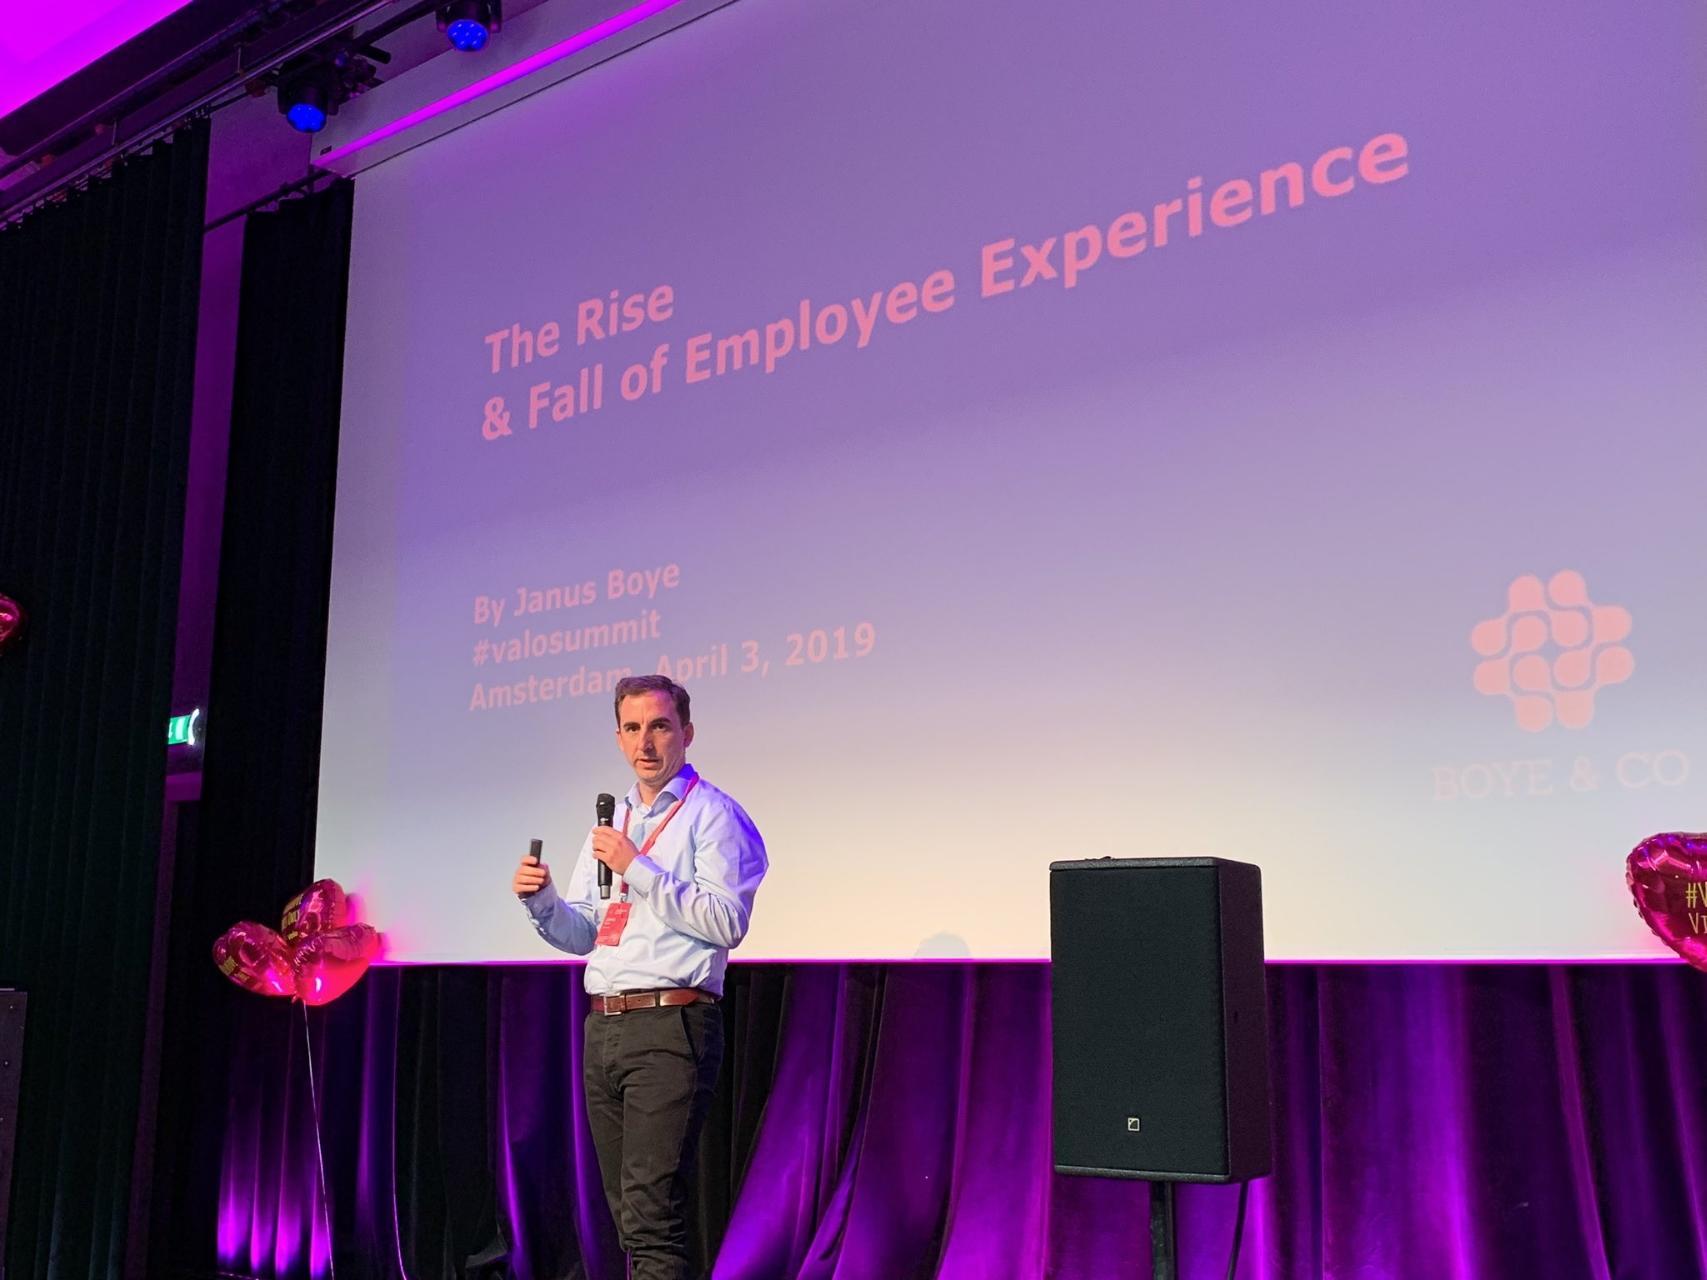 janus-boye-stage-employee-experience-amsterdam.jpg